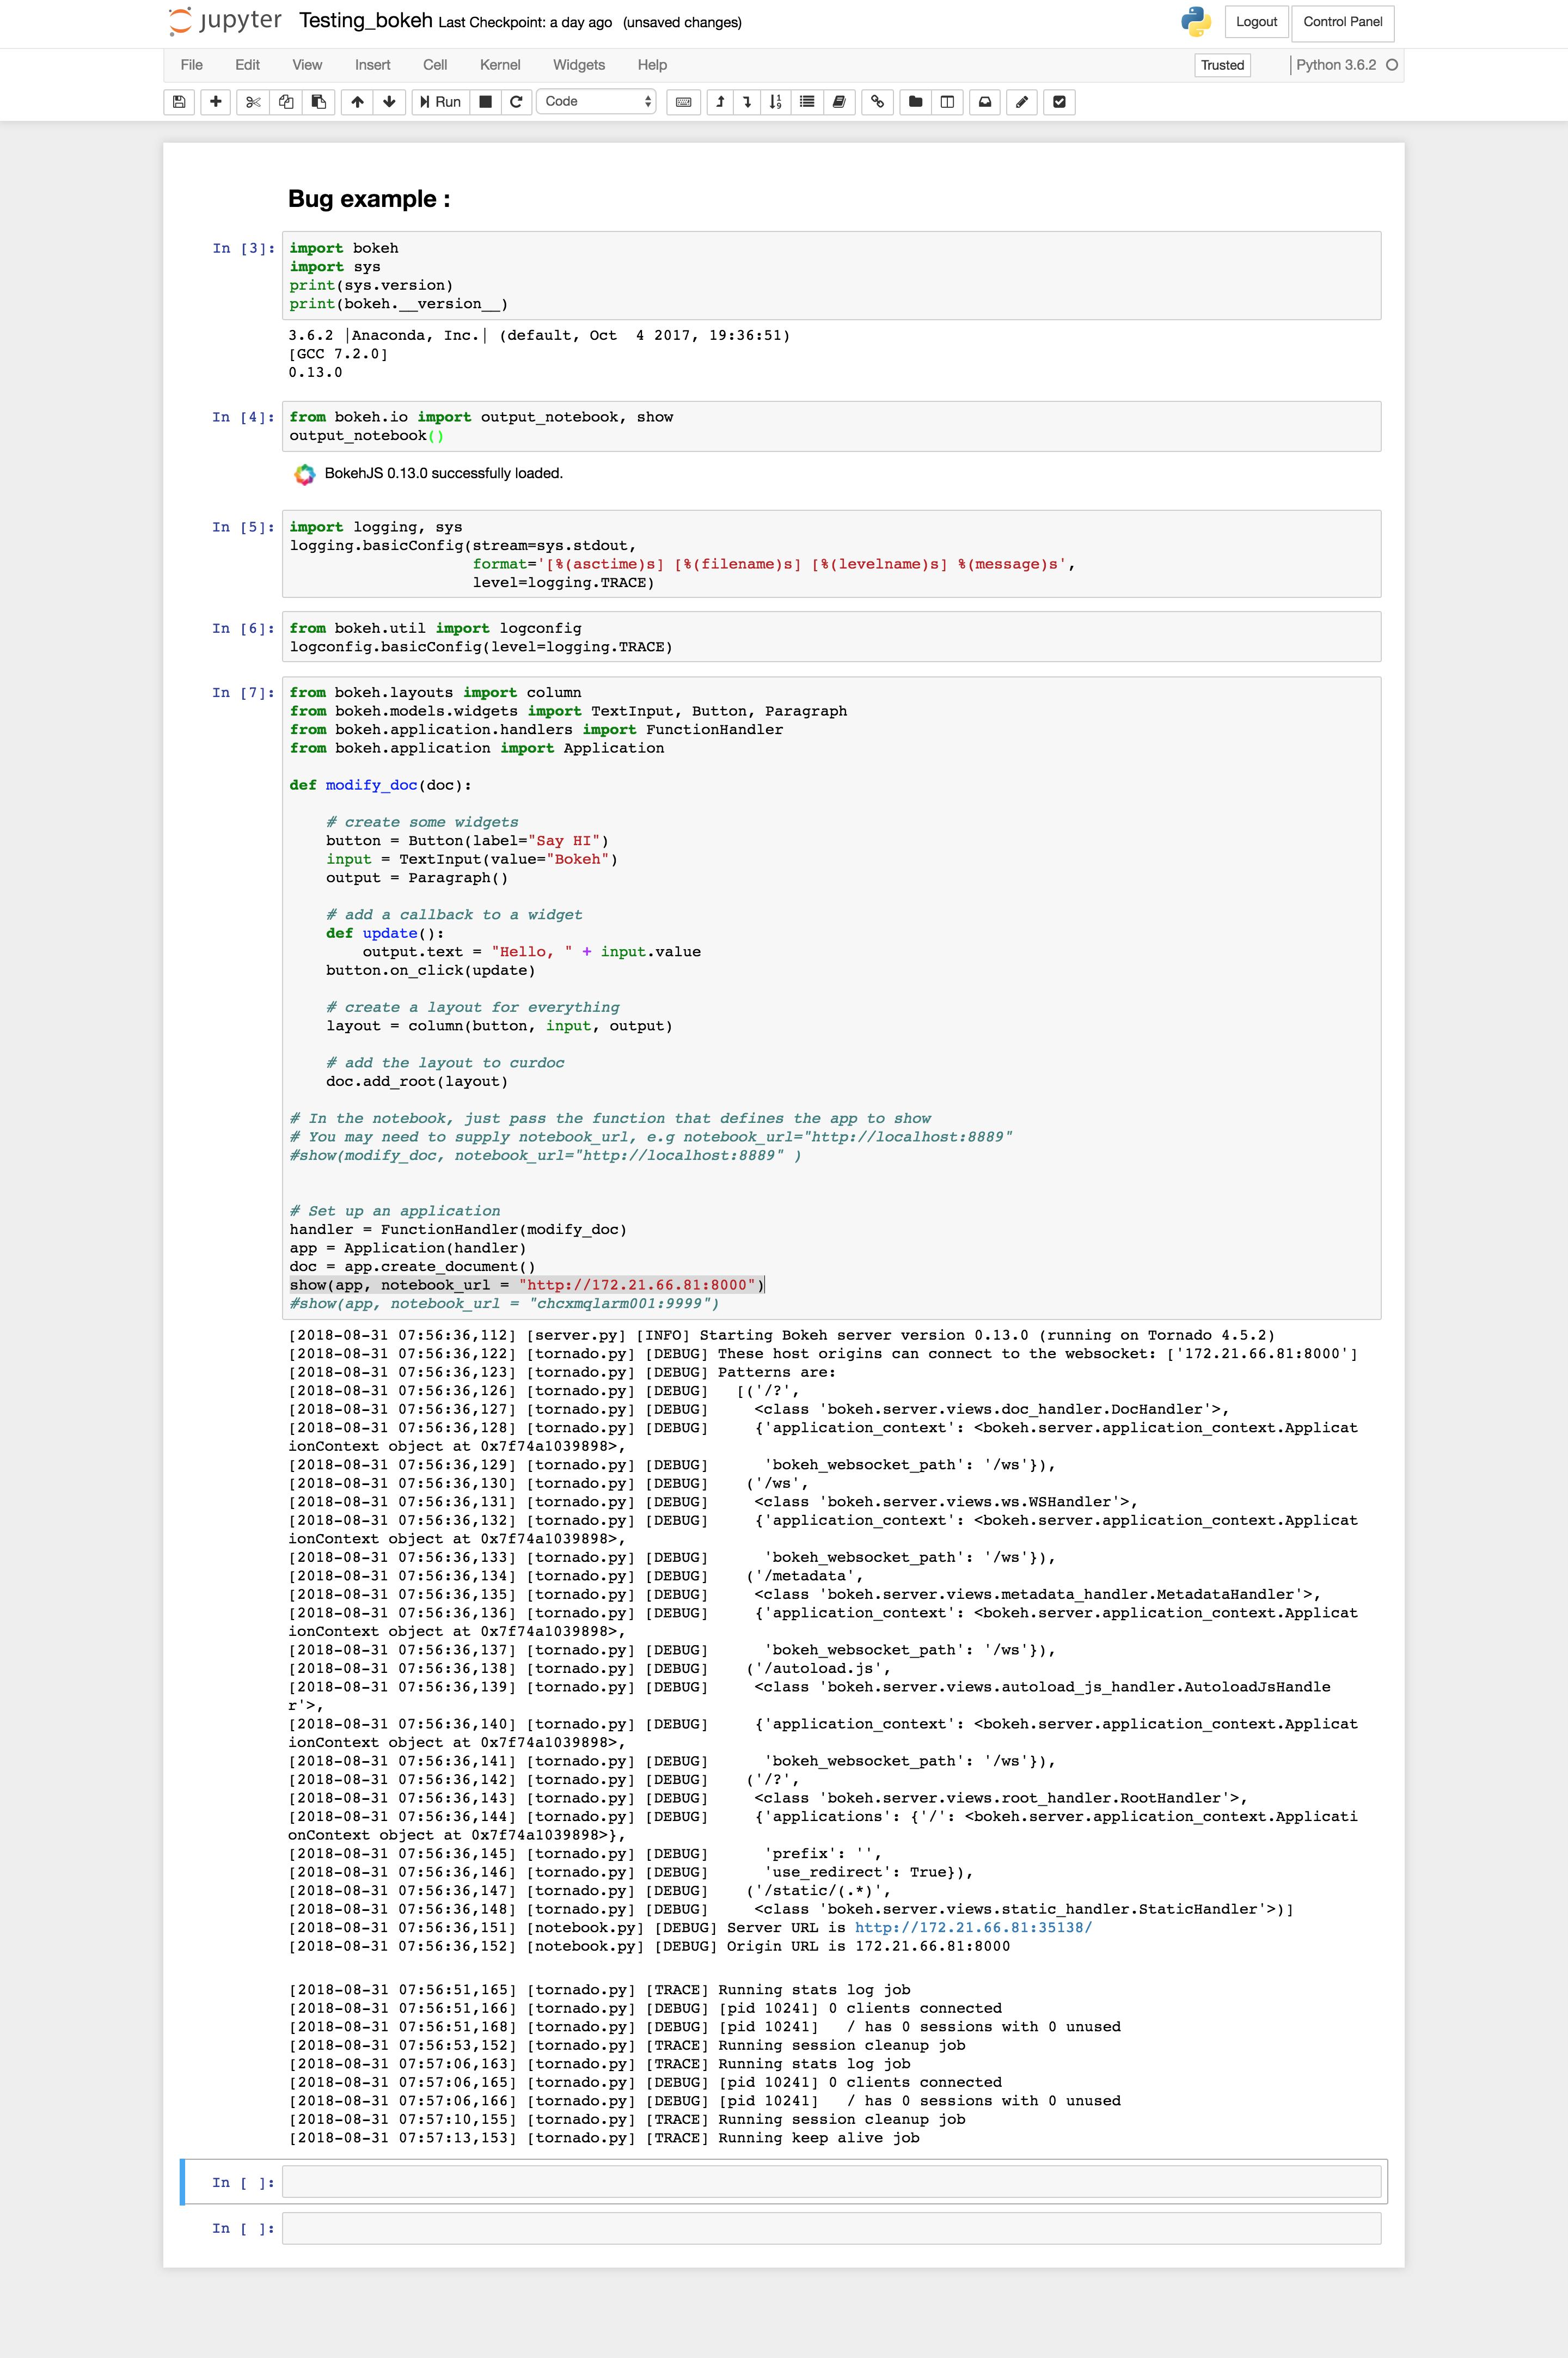 screencapture-172-21-66-81-8000-user-jlescutmuller-notebooks-Testing_bokeh-ipynb-2018-08-31-09_57_14.png